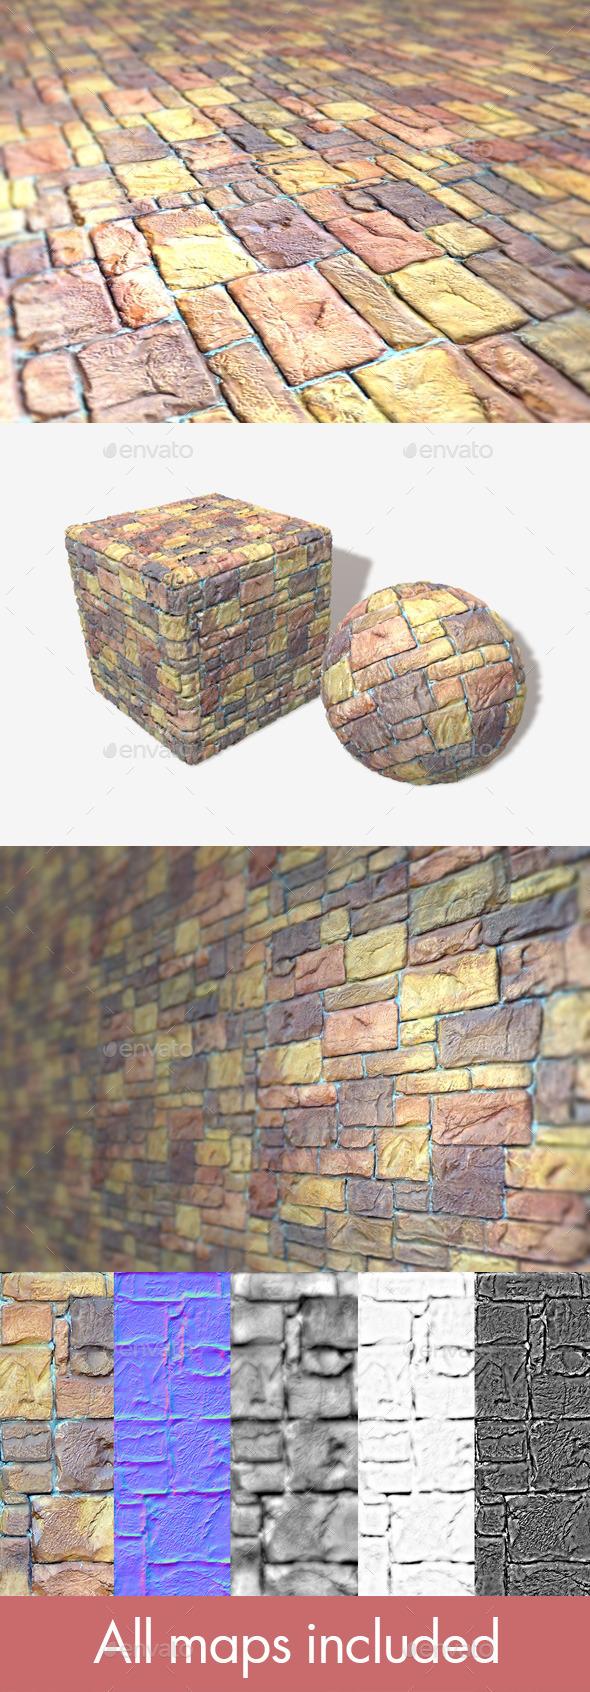 Painted Random Bricks Seamless Texture - 3DOcean Item for Sale